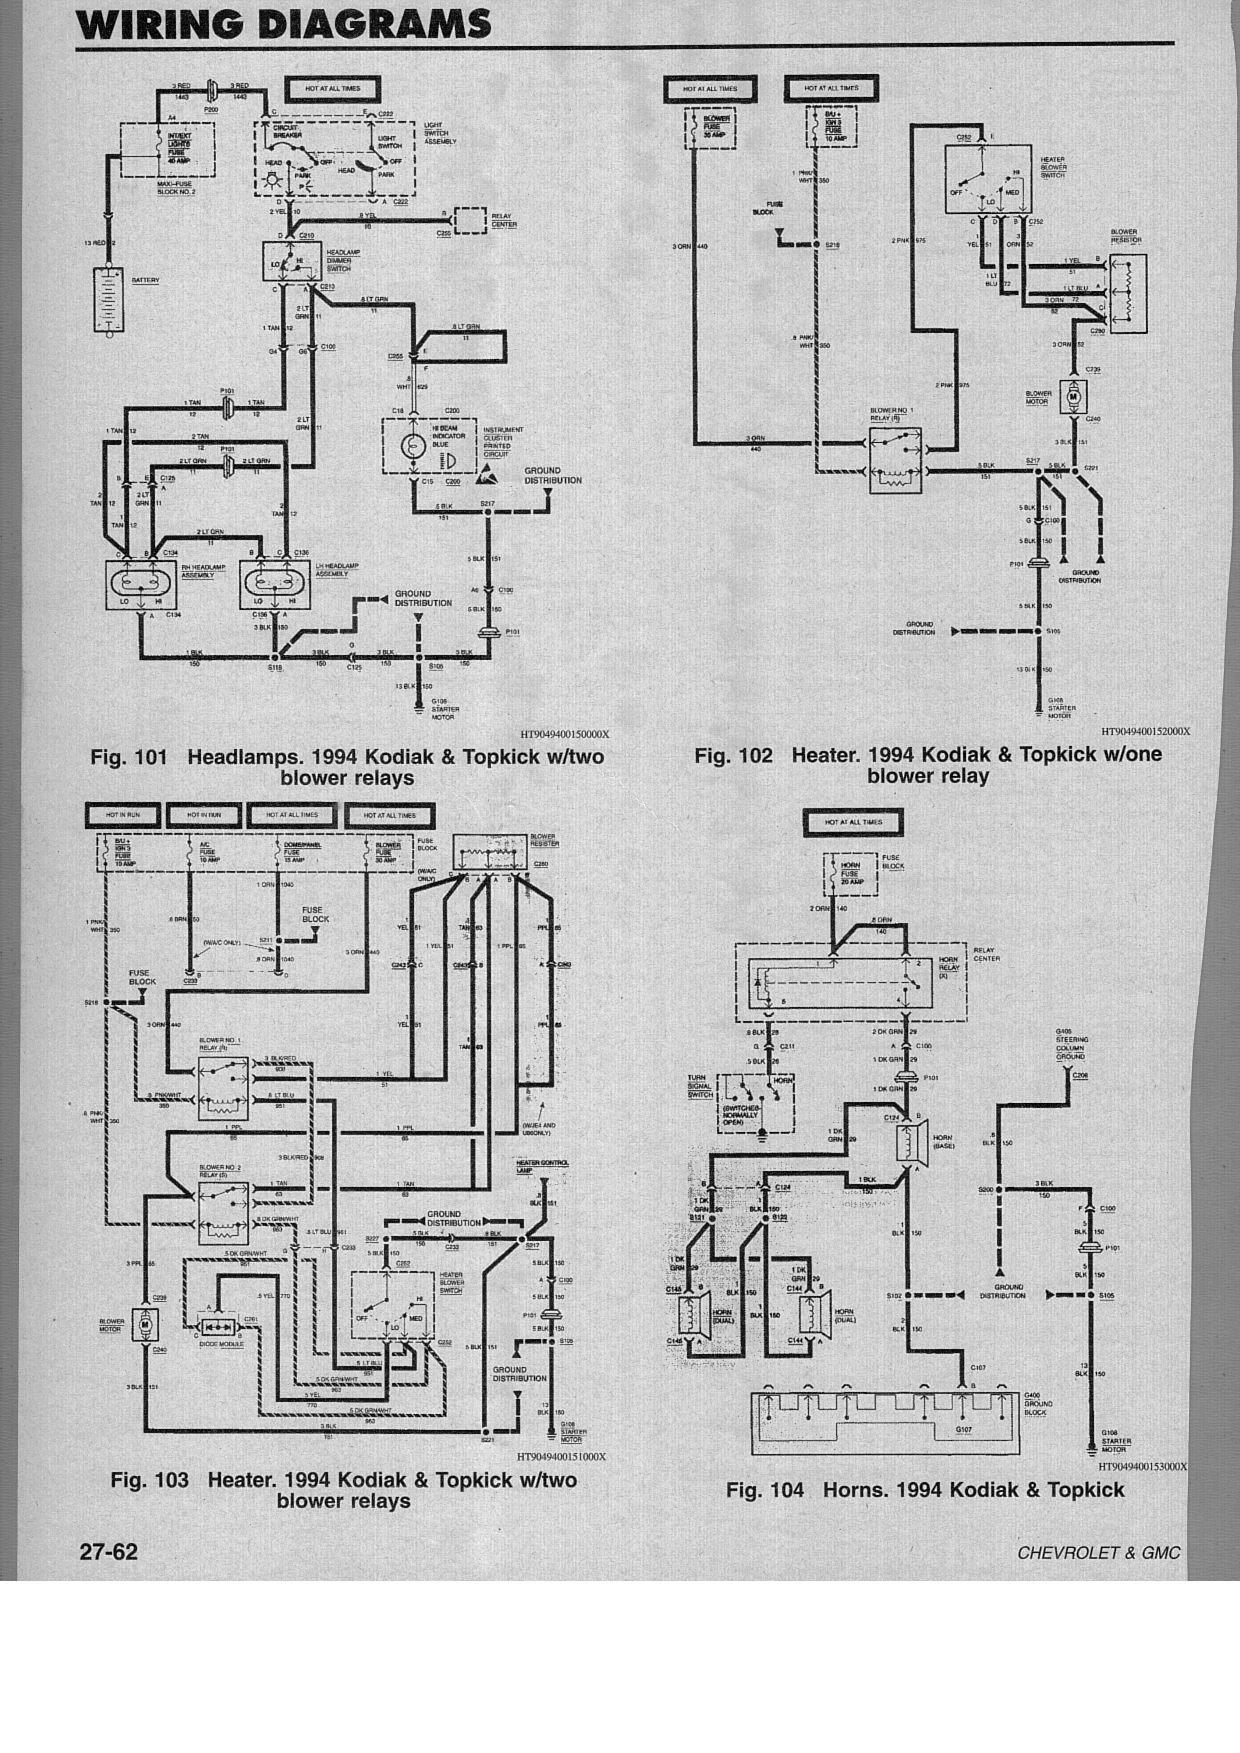 Diagram 2015 Gmc Sierra Wiring Diagram Full Version Hd Quality Wiring Diagram Losh Diagram Editions Delpierre Fr